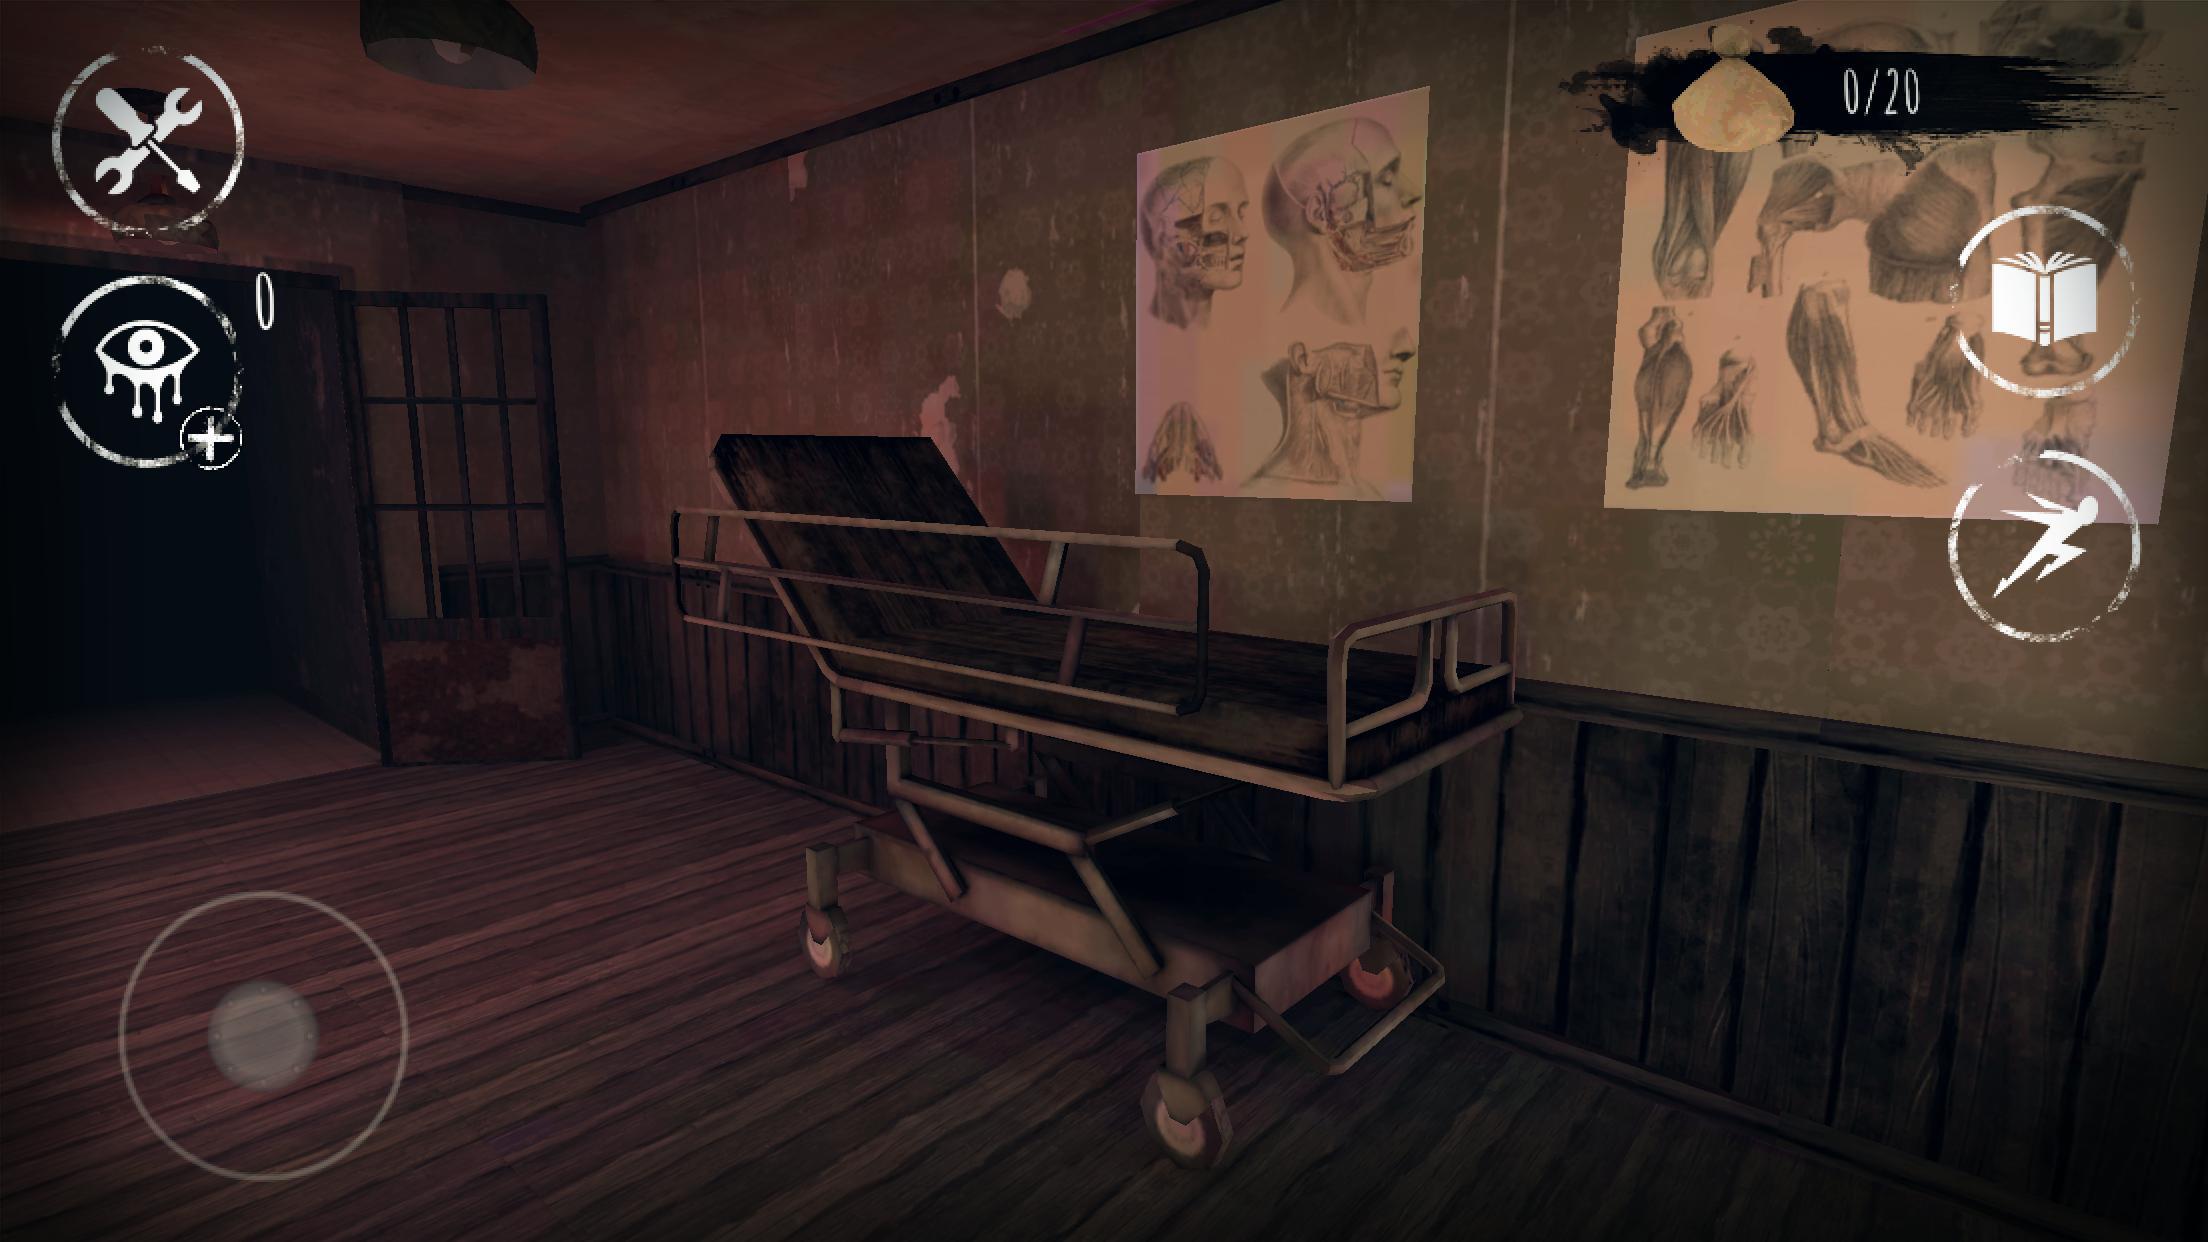 Eyes: Scary Thriller - Creepy Horror Game 6.1.21 Screenshot 11